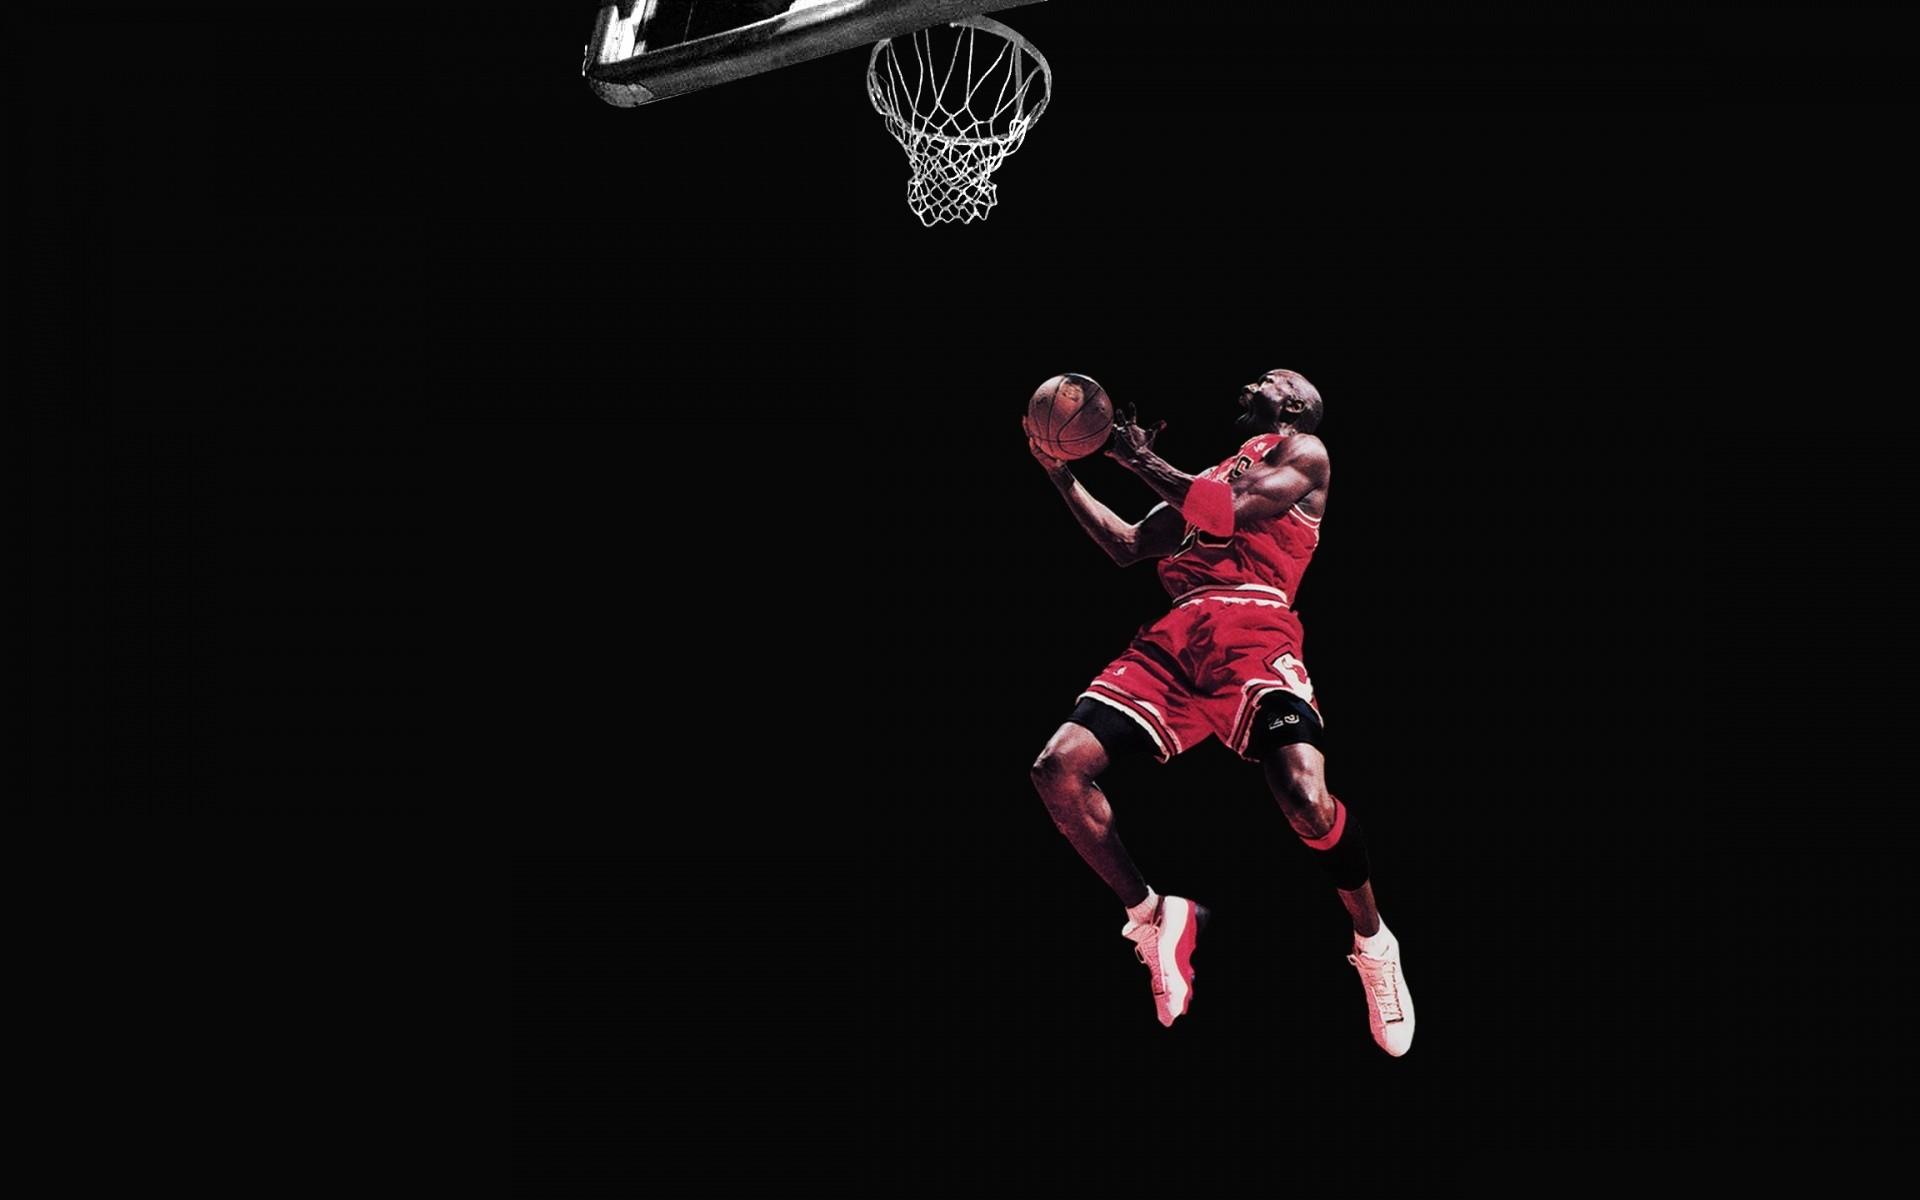 Michael Jordan Chicago Bulls Basketball Jump Black wallpaper 1920x1200